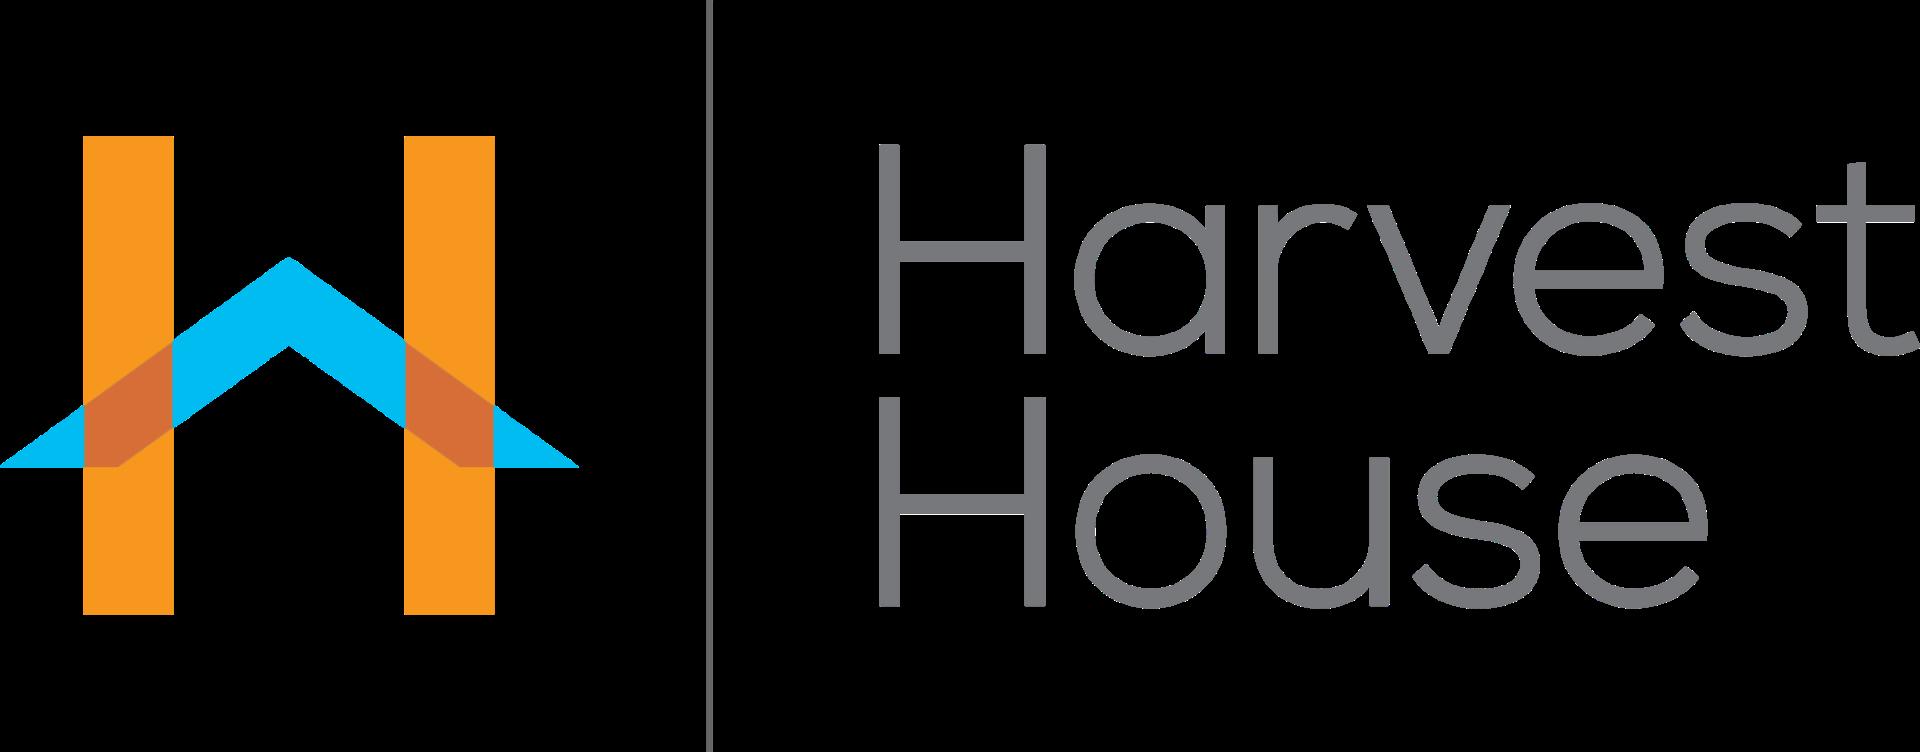 harvest house centers logo